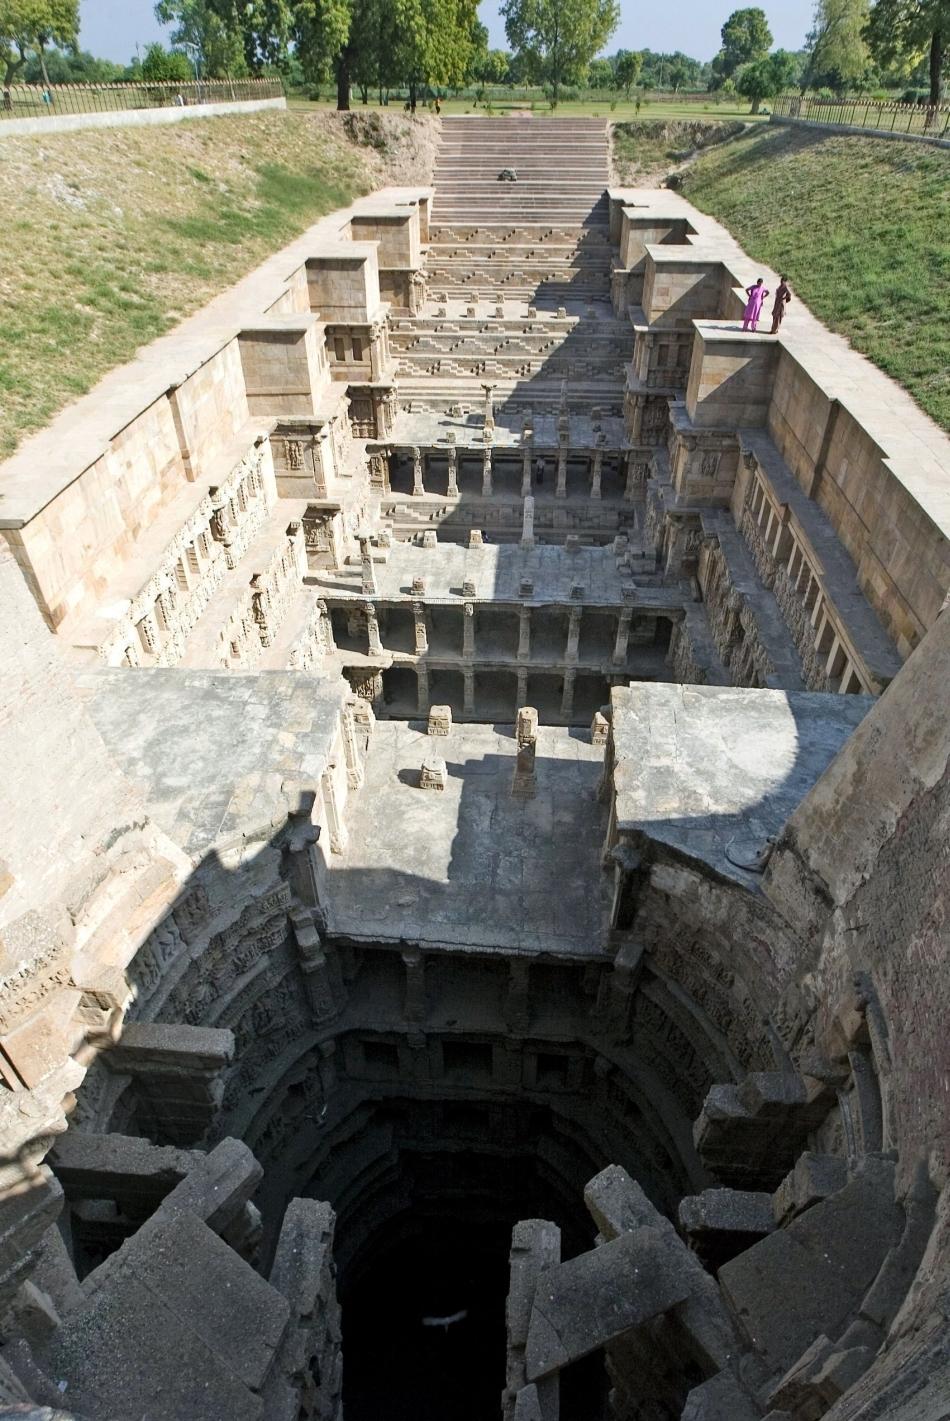 Templul Rani-ki-Vav, care s-ar putea traduce prin